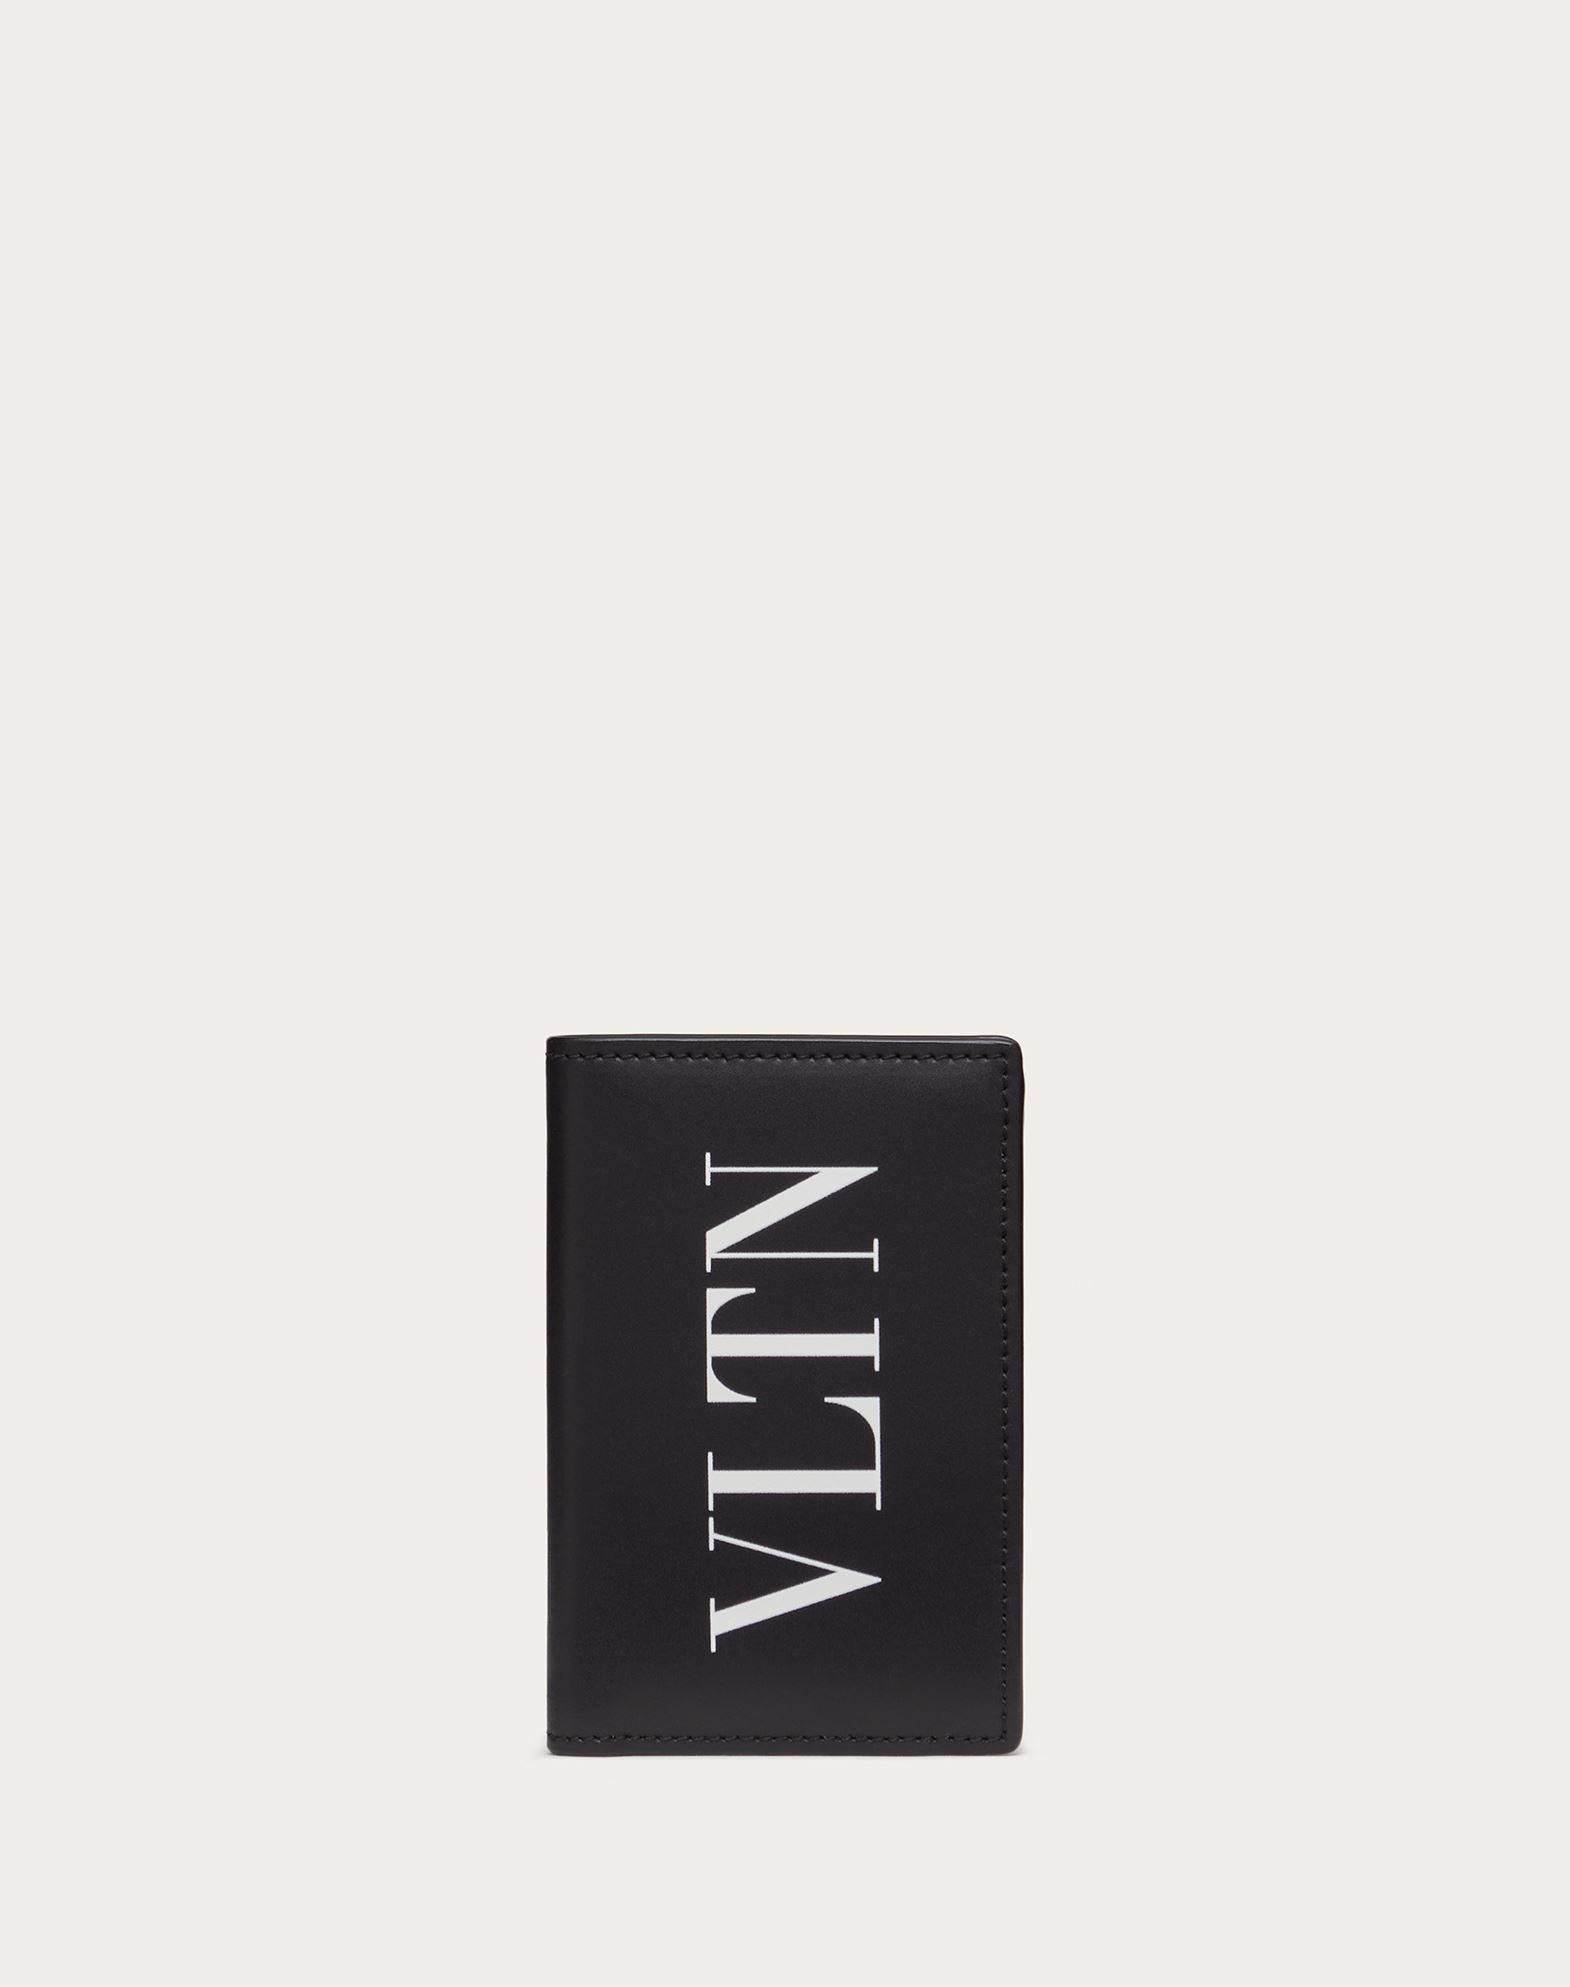 VALENTINO GARAVANI UOMO VLTN card holder COIN PURSES & CARD CASES U f